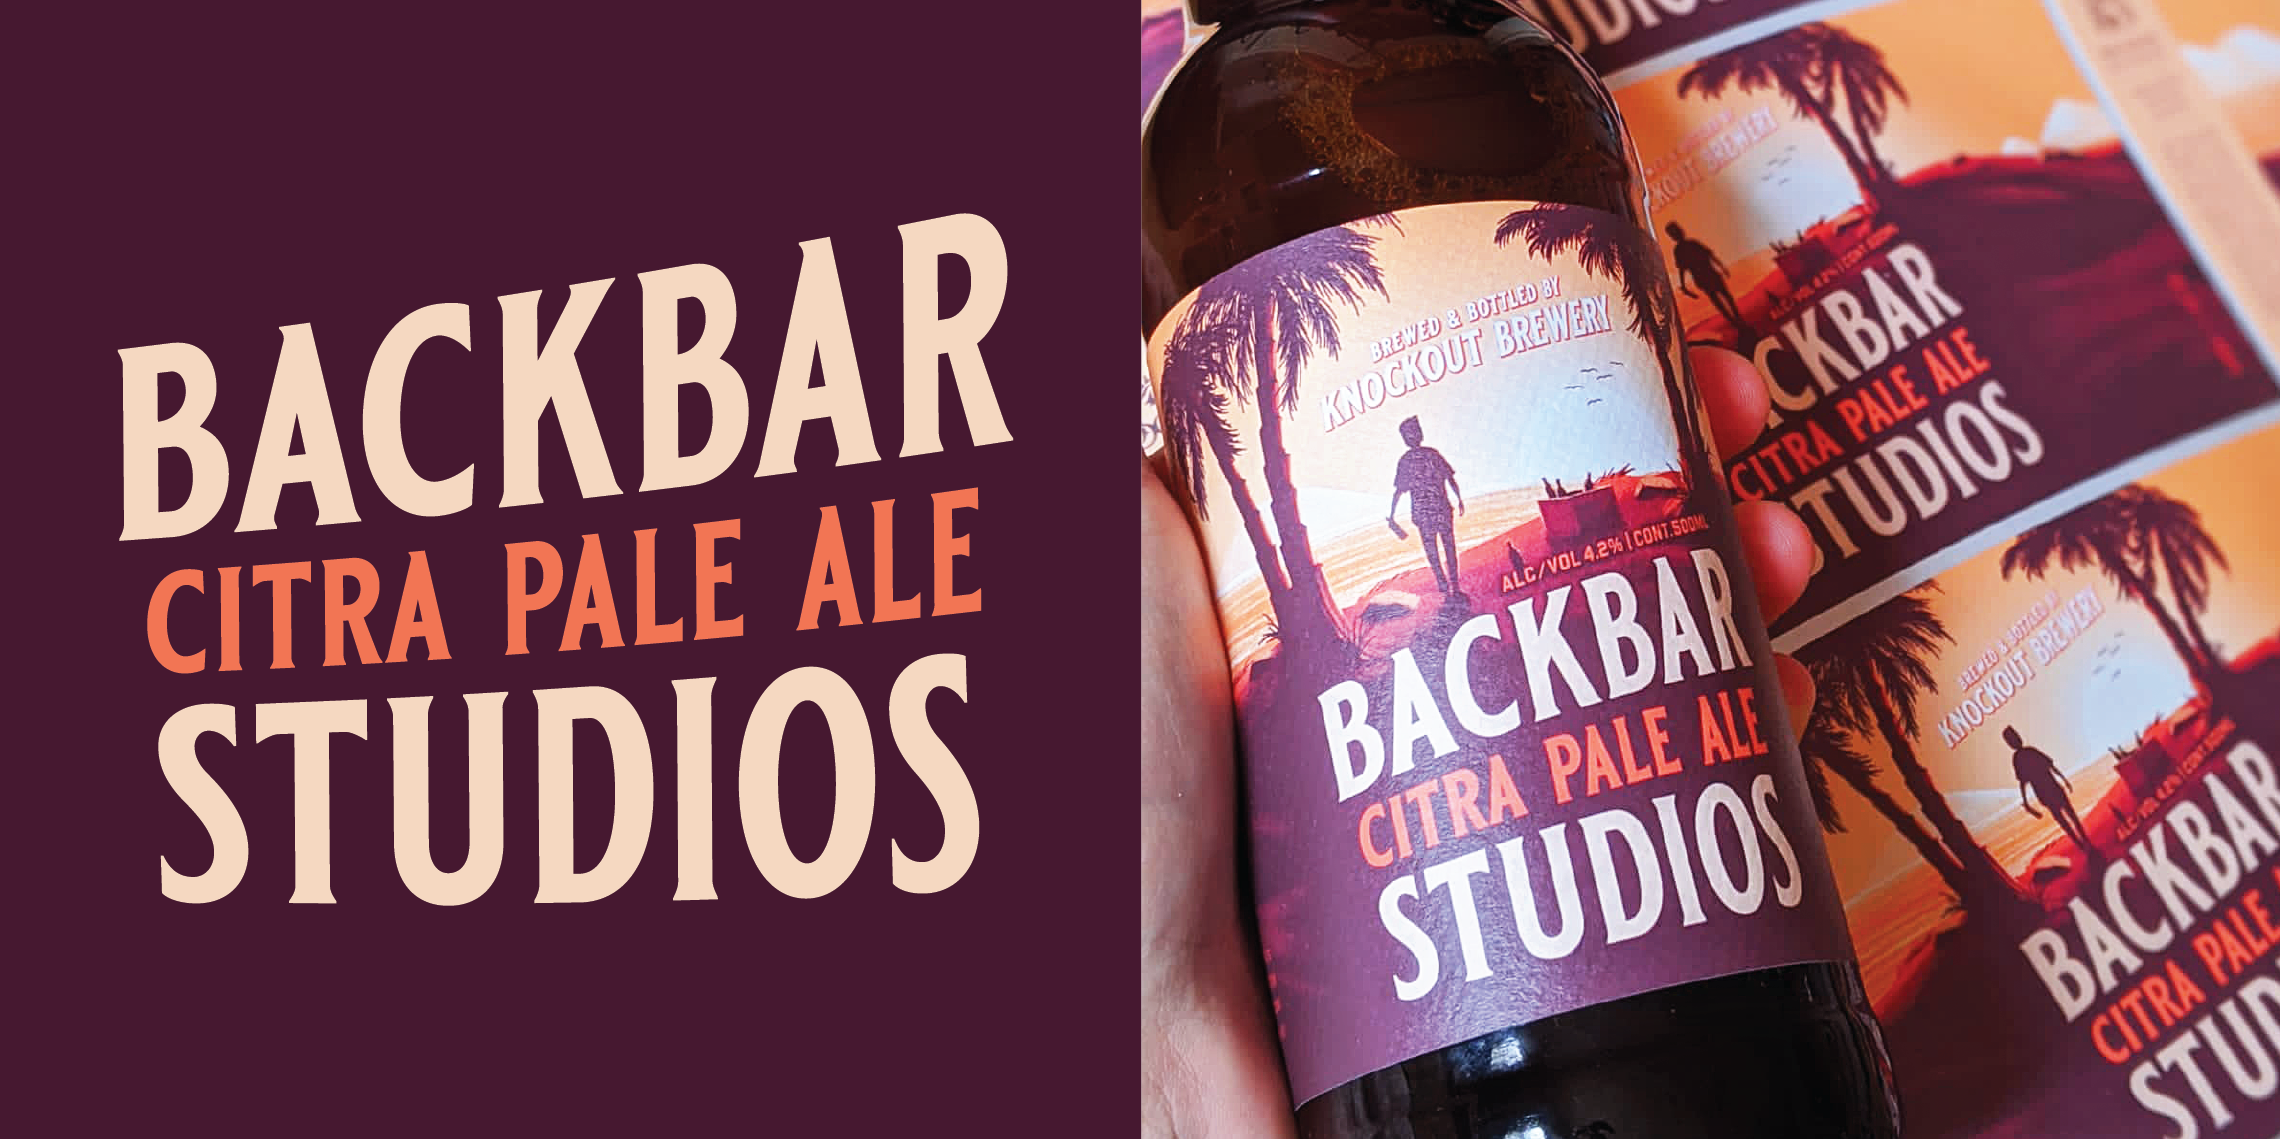 Backbar Studios Extremely Small Batch Studio Beer